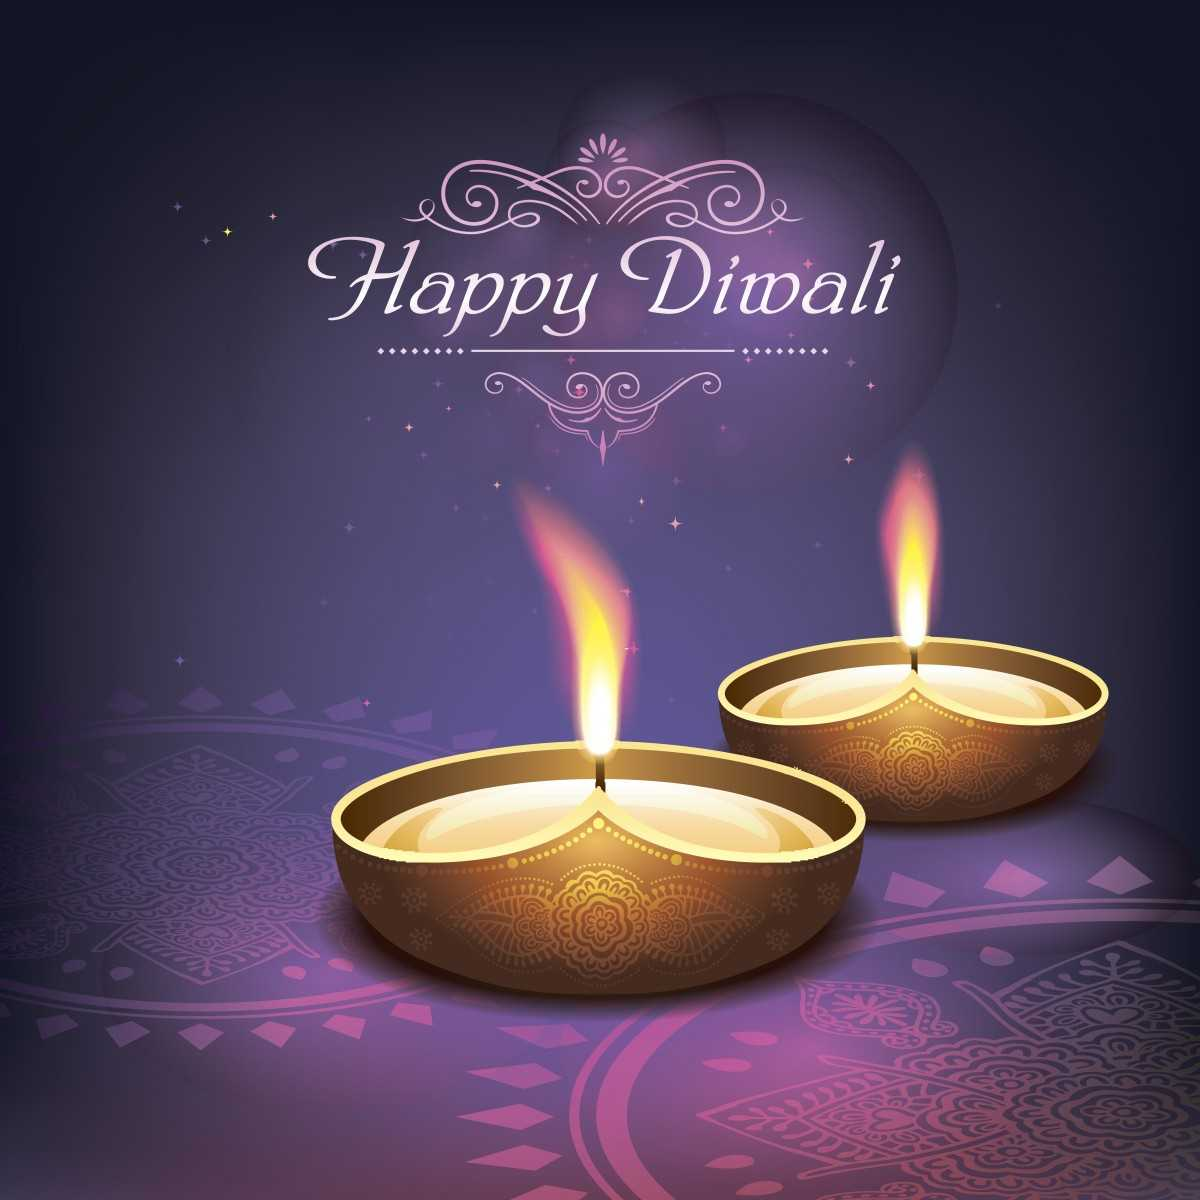 Happy Diwali Short Whatsapp Status DP and Images - Happy ...